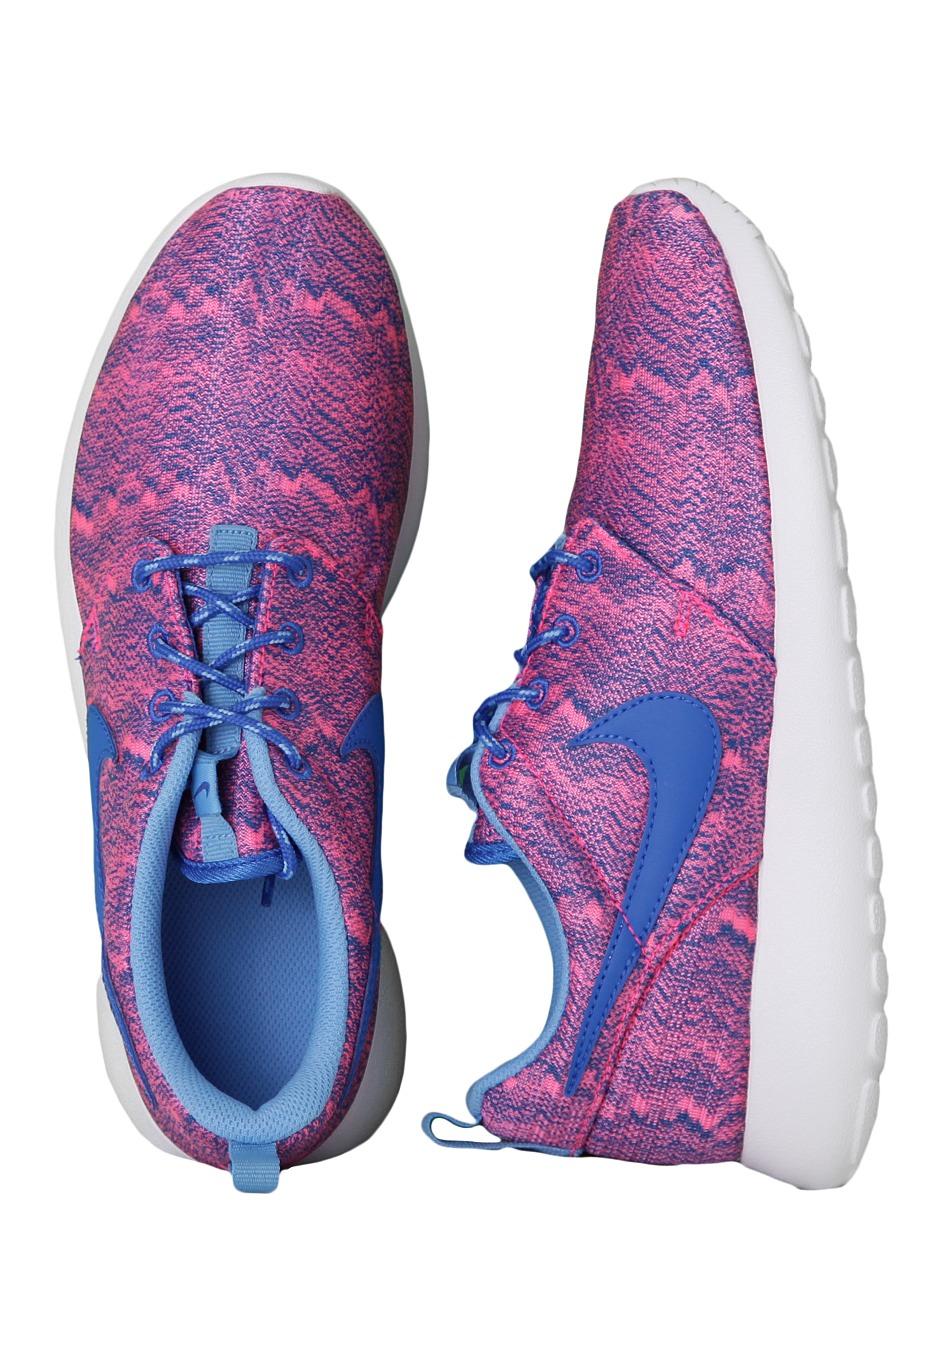 a5e849e32351 ... cobalt blue 1de42 809ef  norway nike roshe run print gs hyper pink  white girl shoes 71939 c2ff8